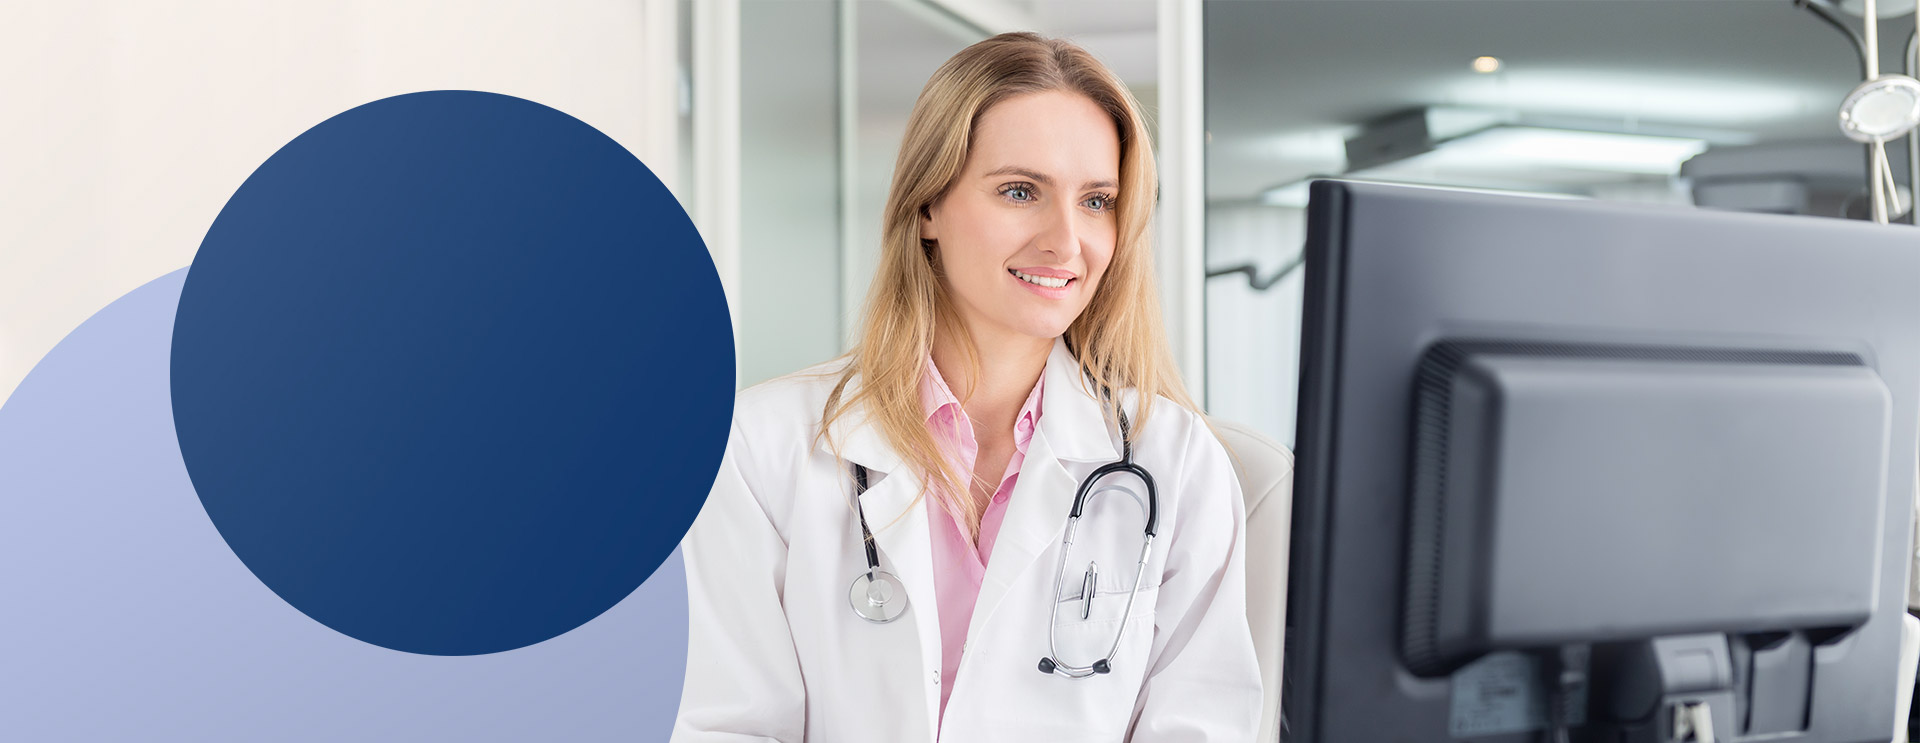 medical and dental jobs